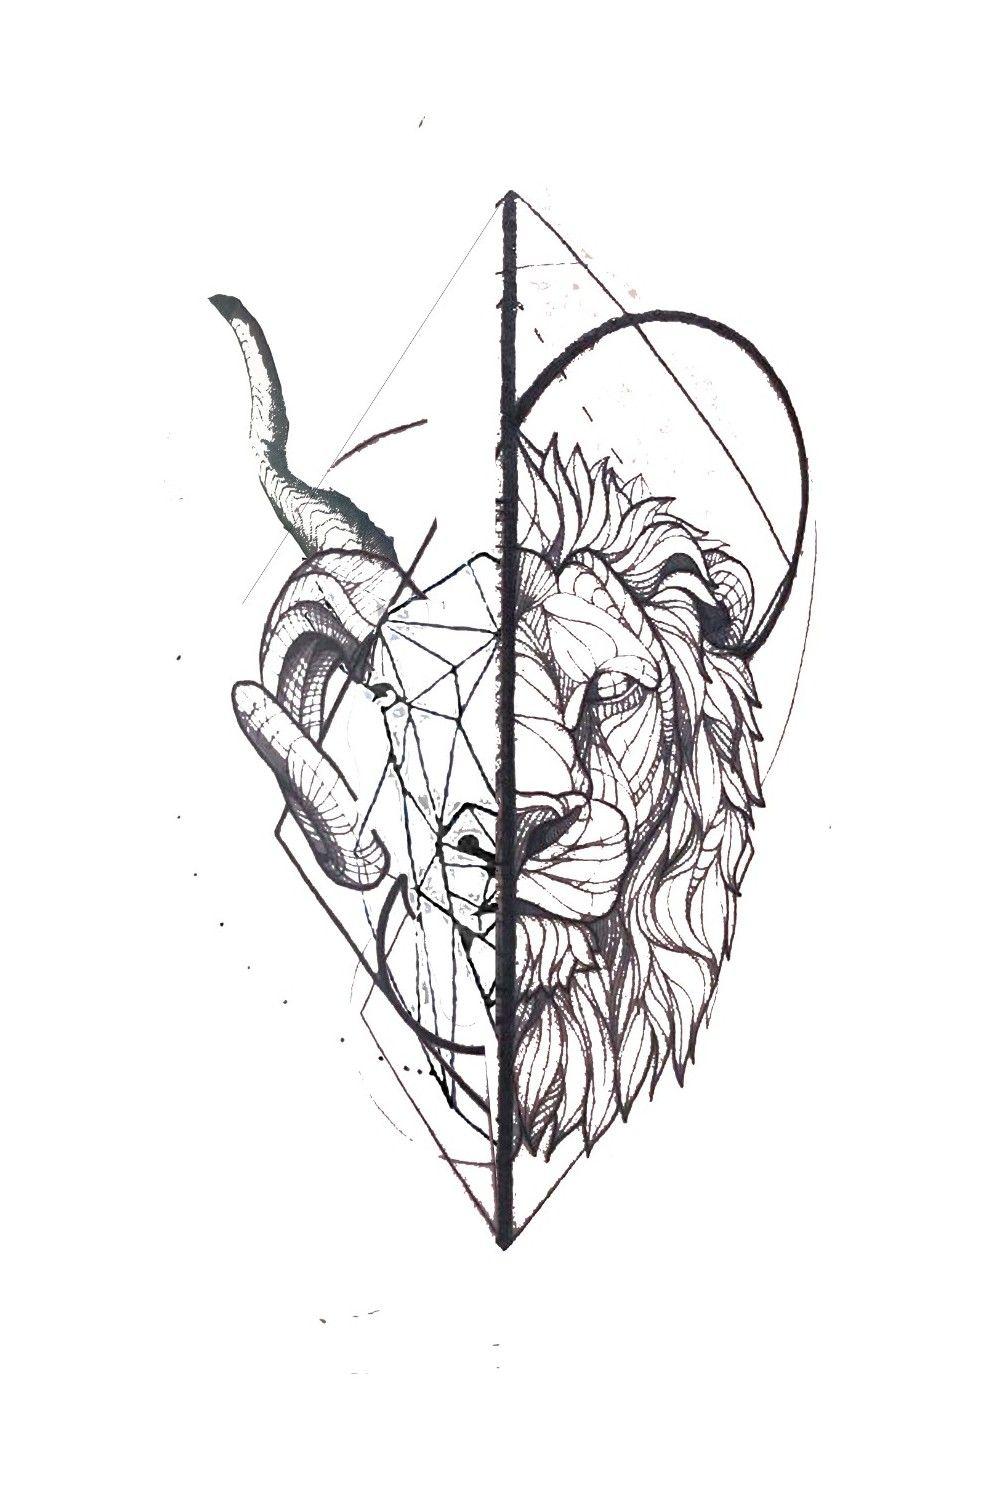 Leo Zodiac Horoscope Sign Symbol Tattoo Designs (104)